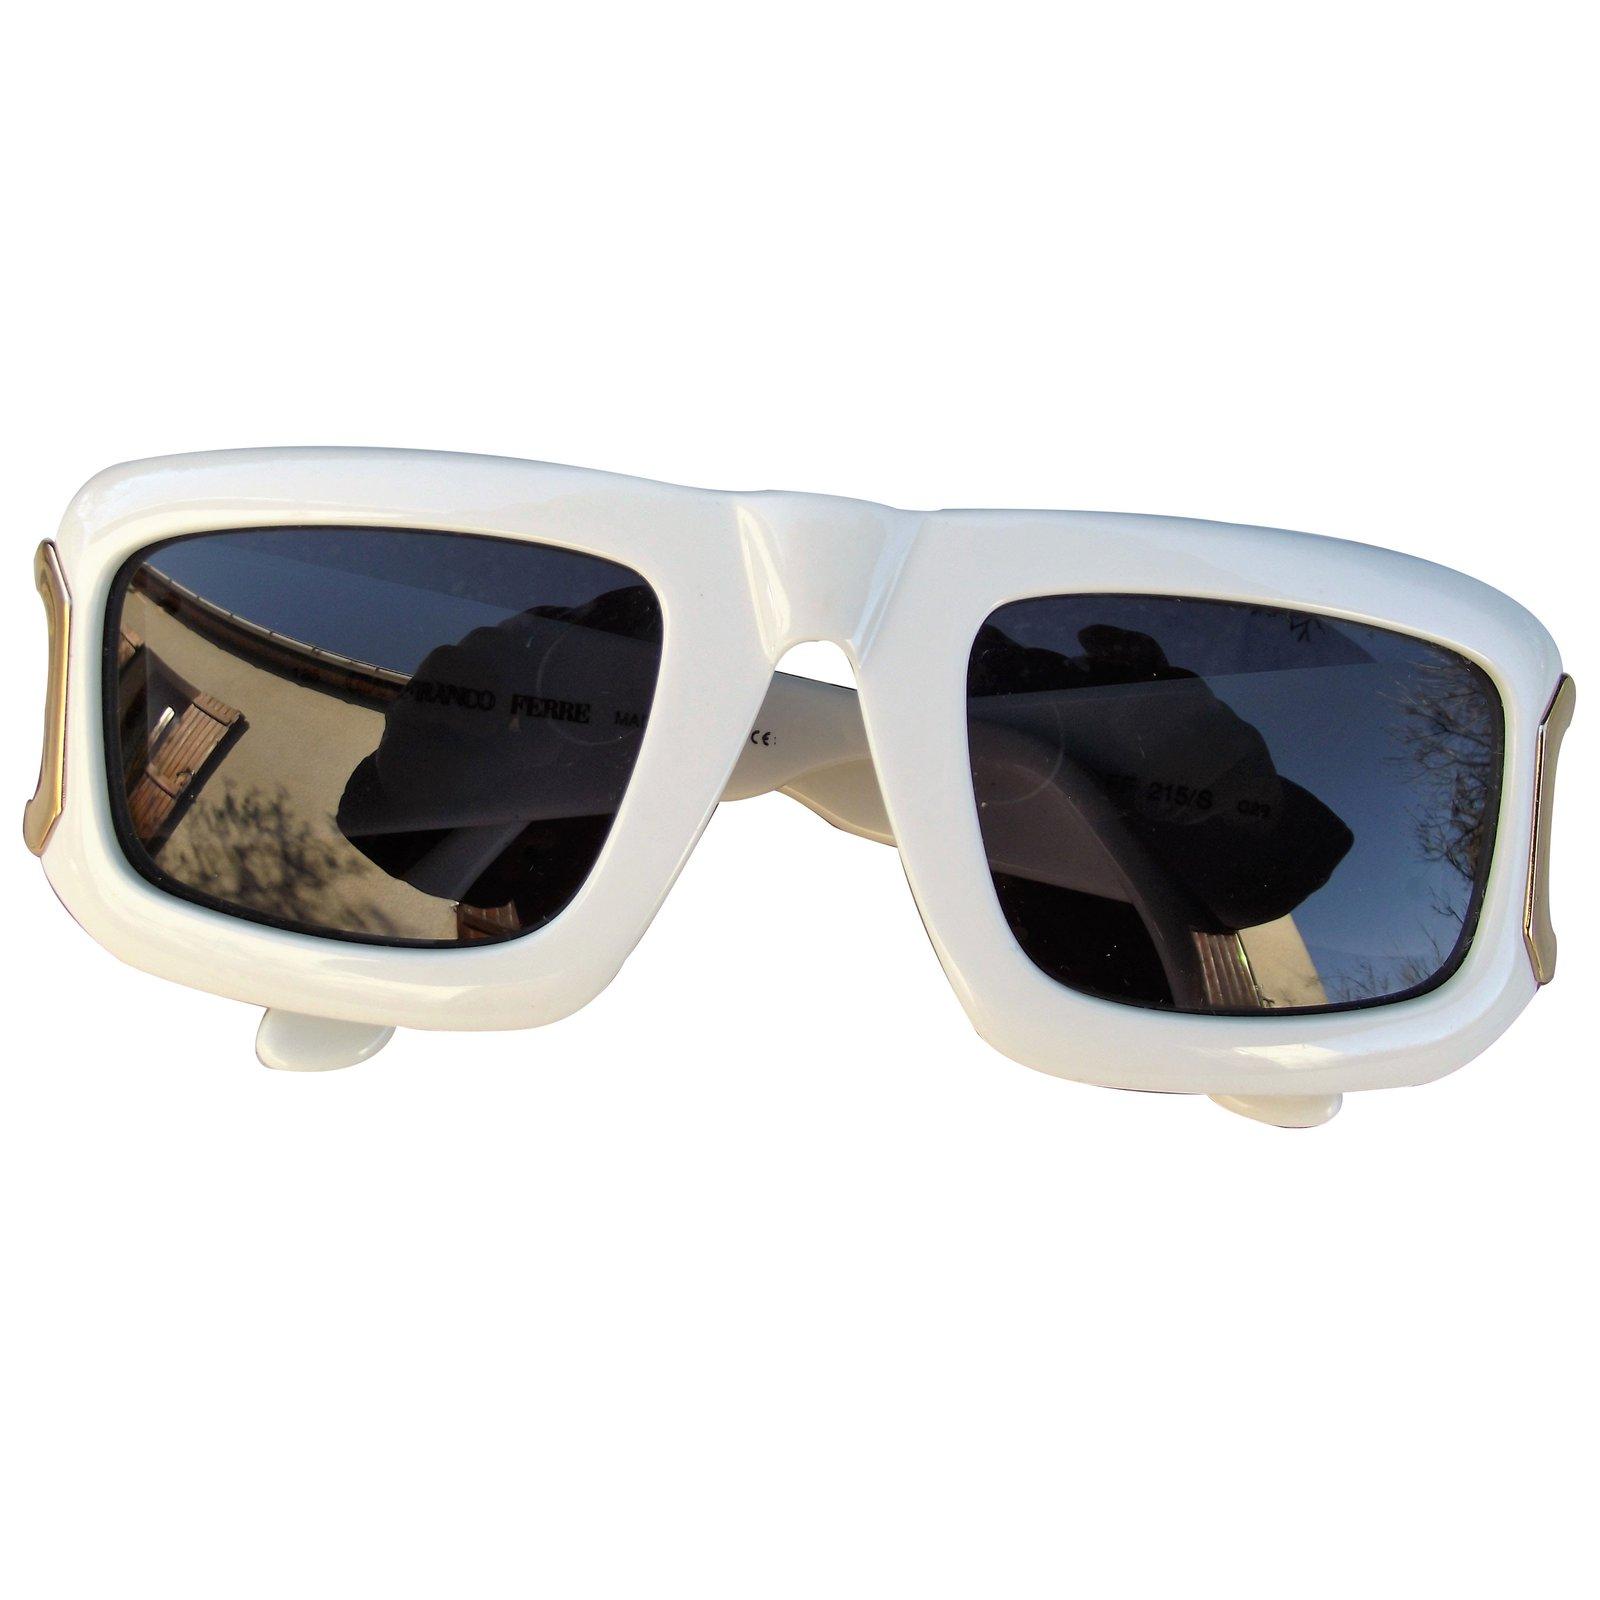 9de2ed8c3af6f Gianfranco Ferré Sunglasses Sunglasses Plastic White ref.11582 ...